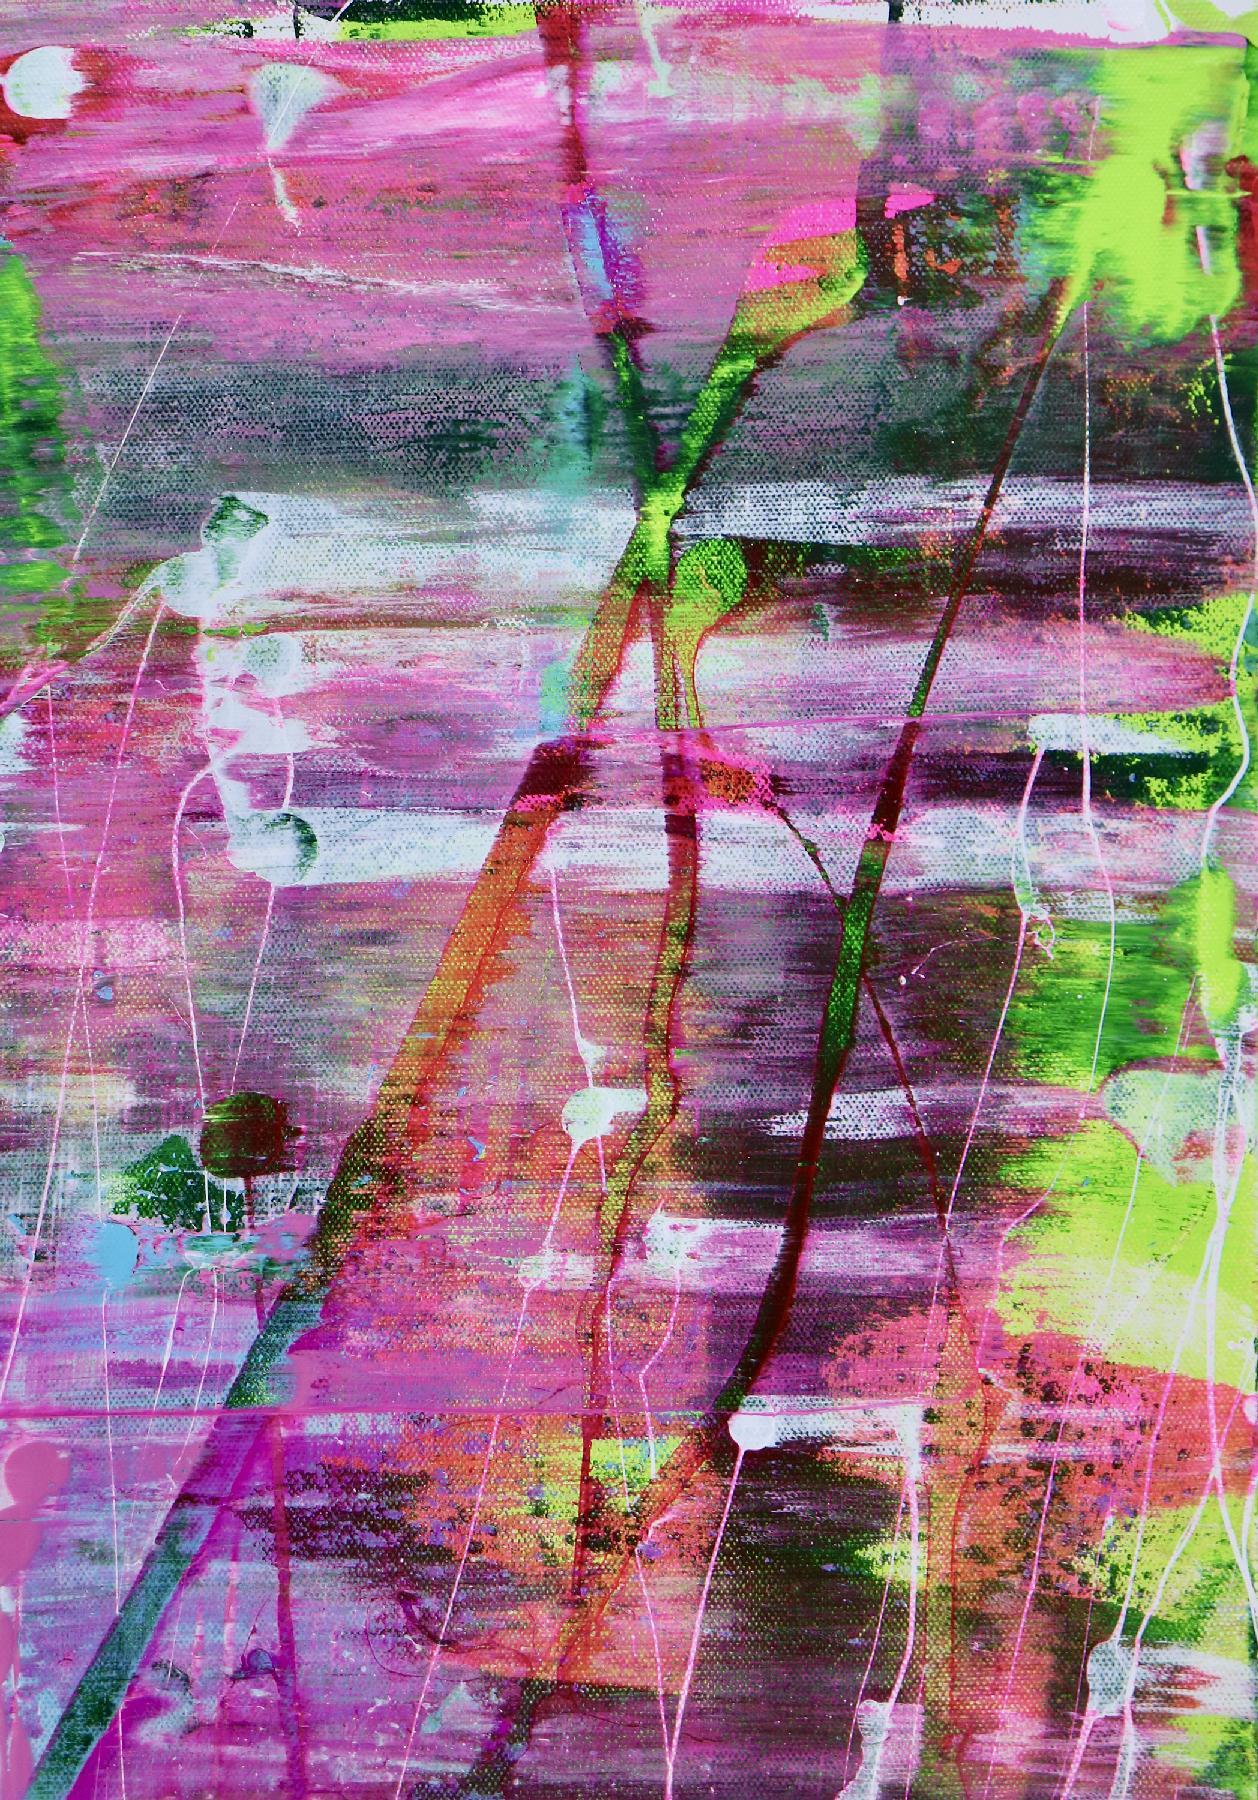 Detail - A Closer Look (Avant Garden) 1 (2020) by Nestor Toro